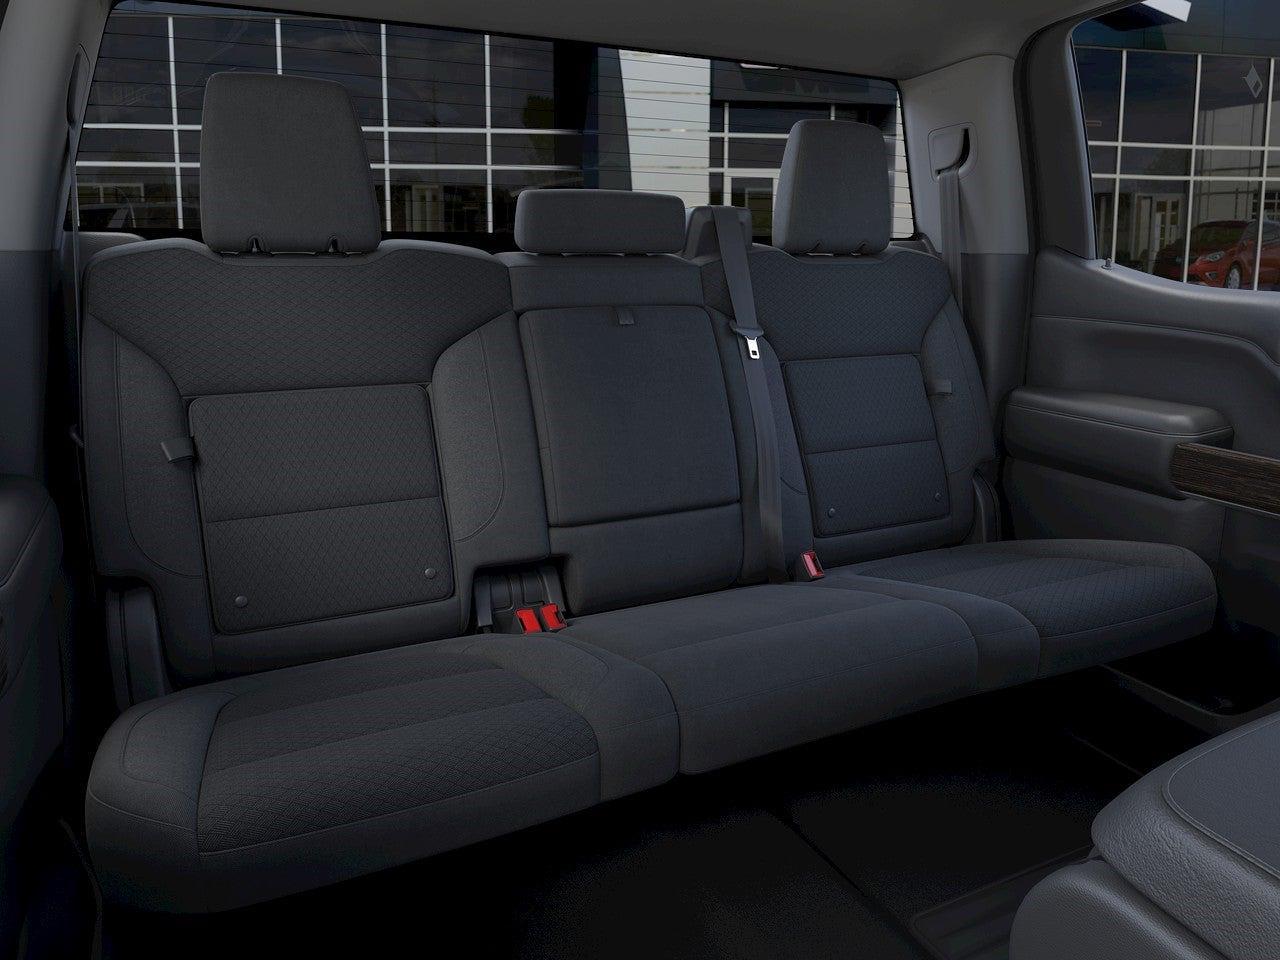 2021 GMC Sierra 1500 Crew Cab 4x4, Pickup #V21220 - photo 34